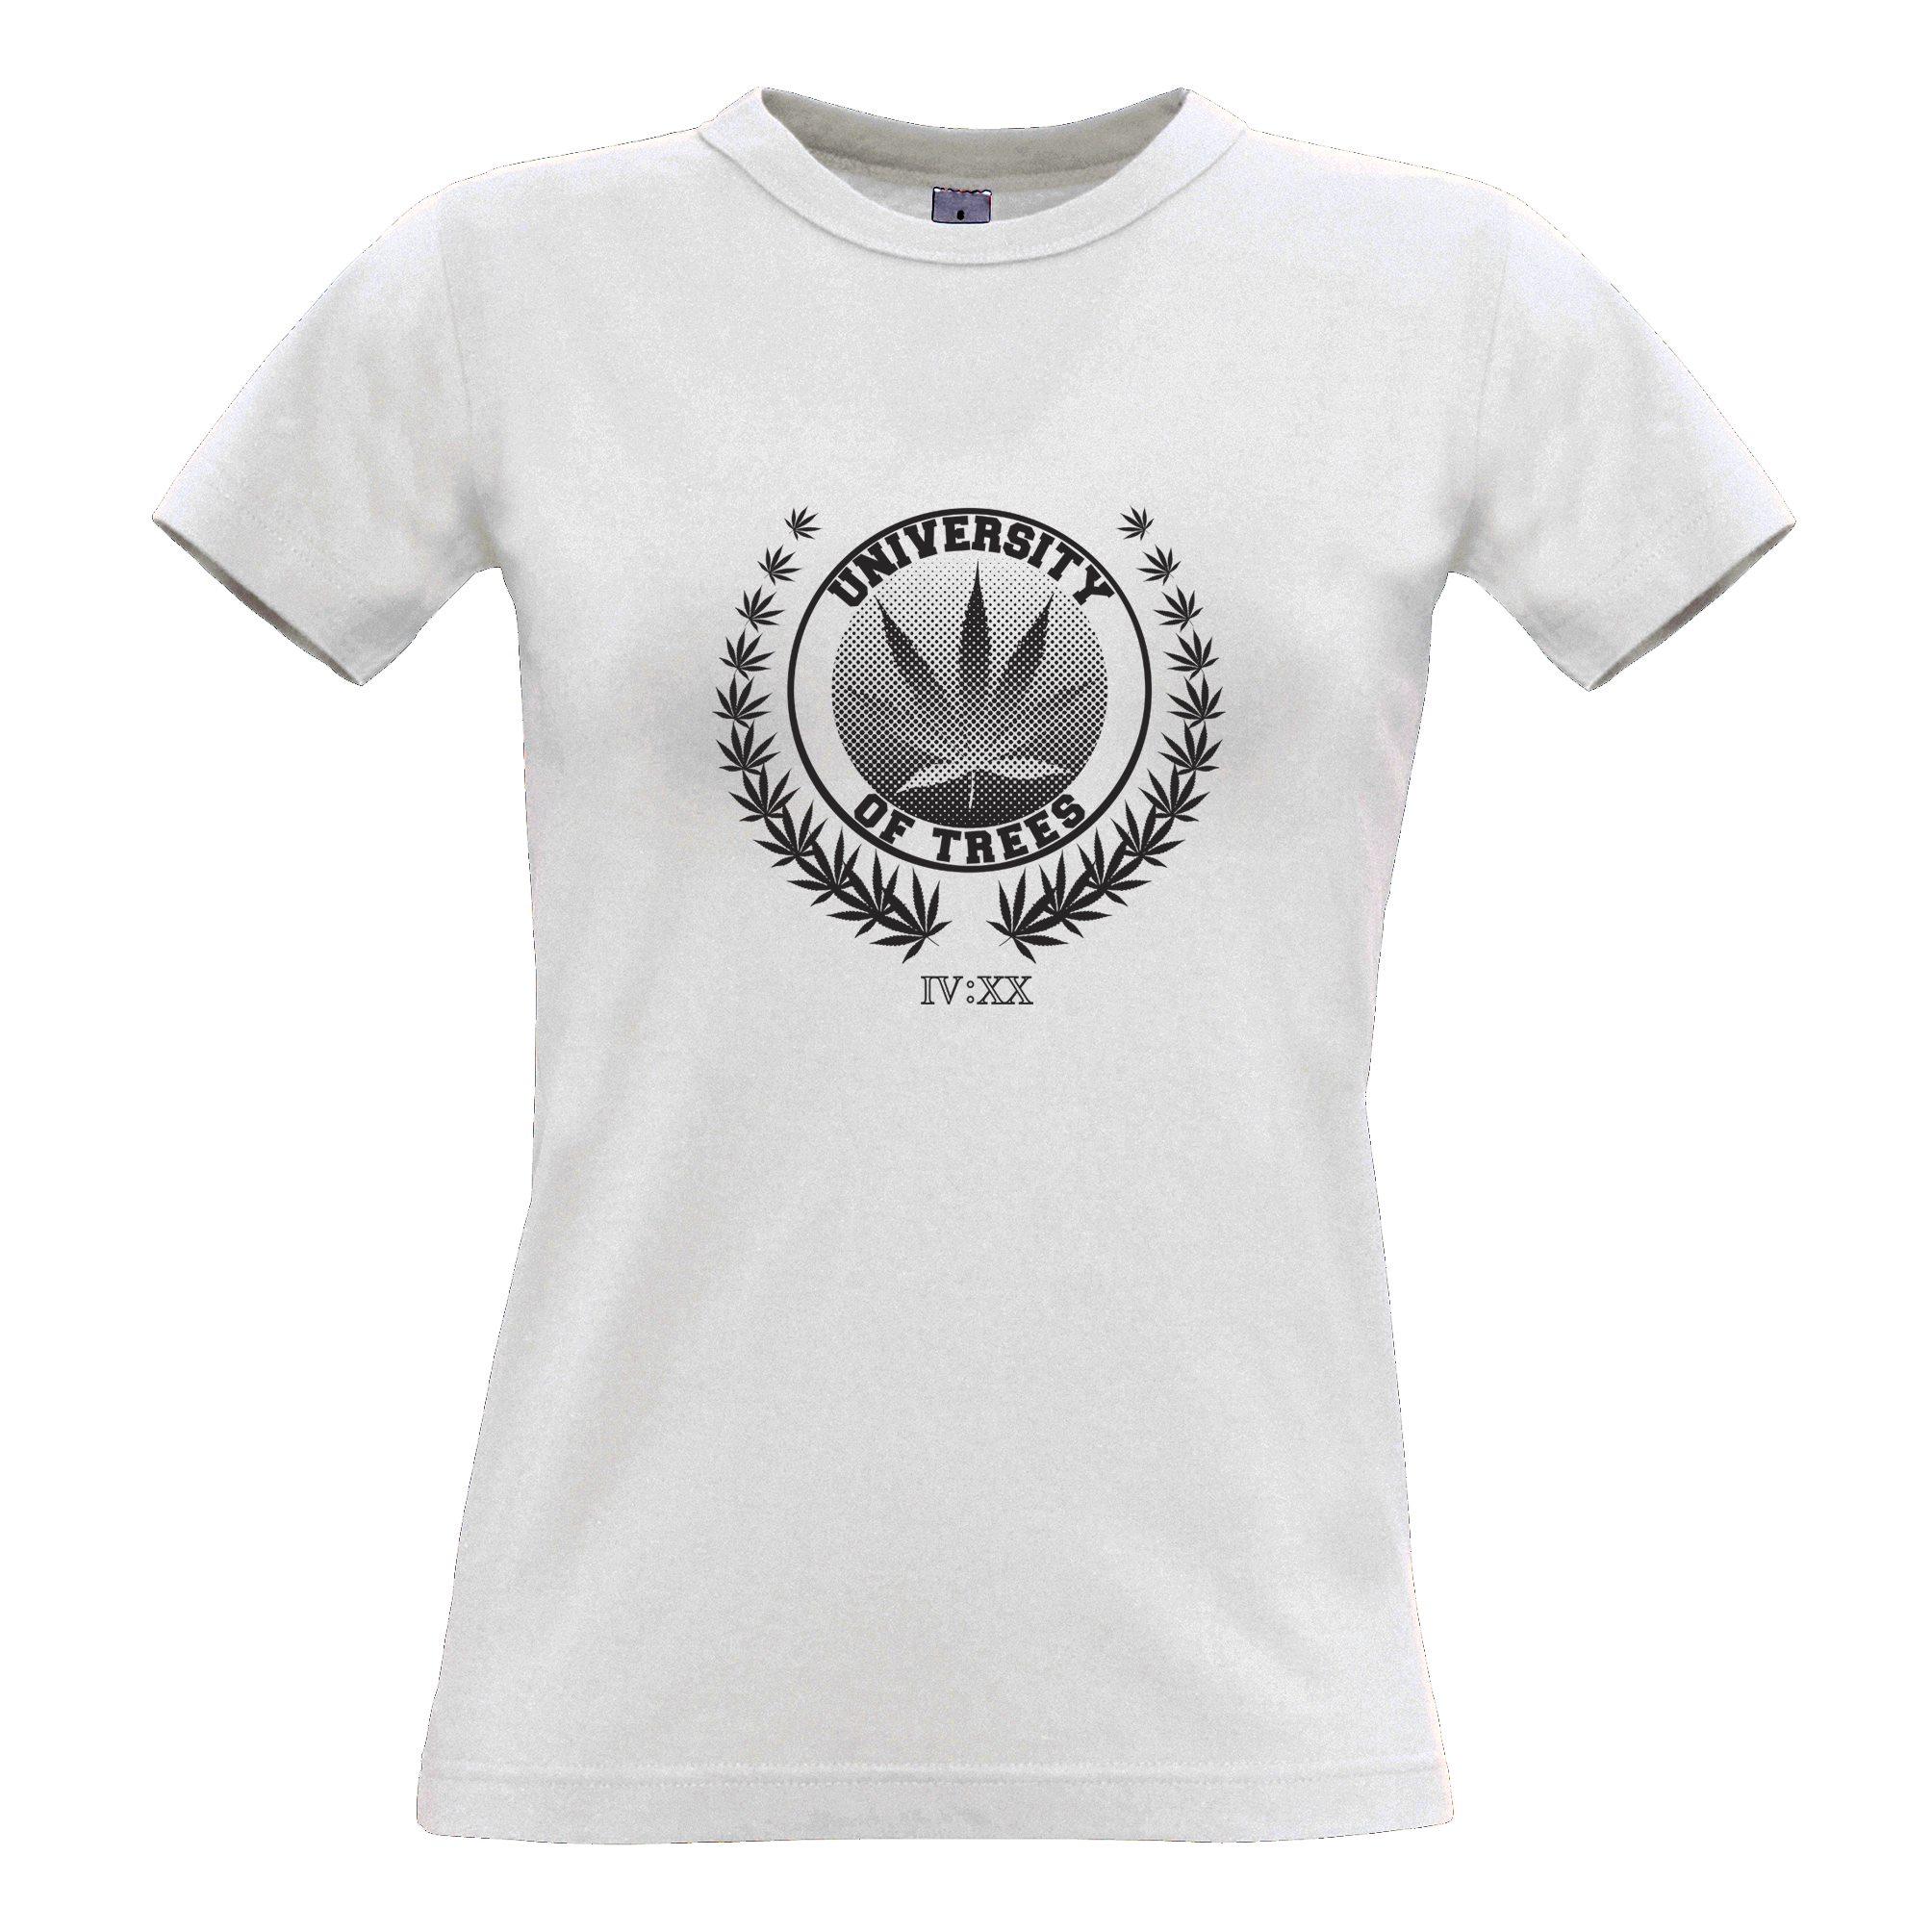 Shirt design reddit - University Of Trees Ents Blunrs Cannabis Smoke Reddit